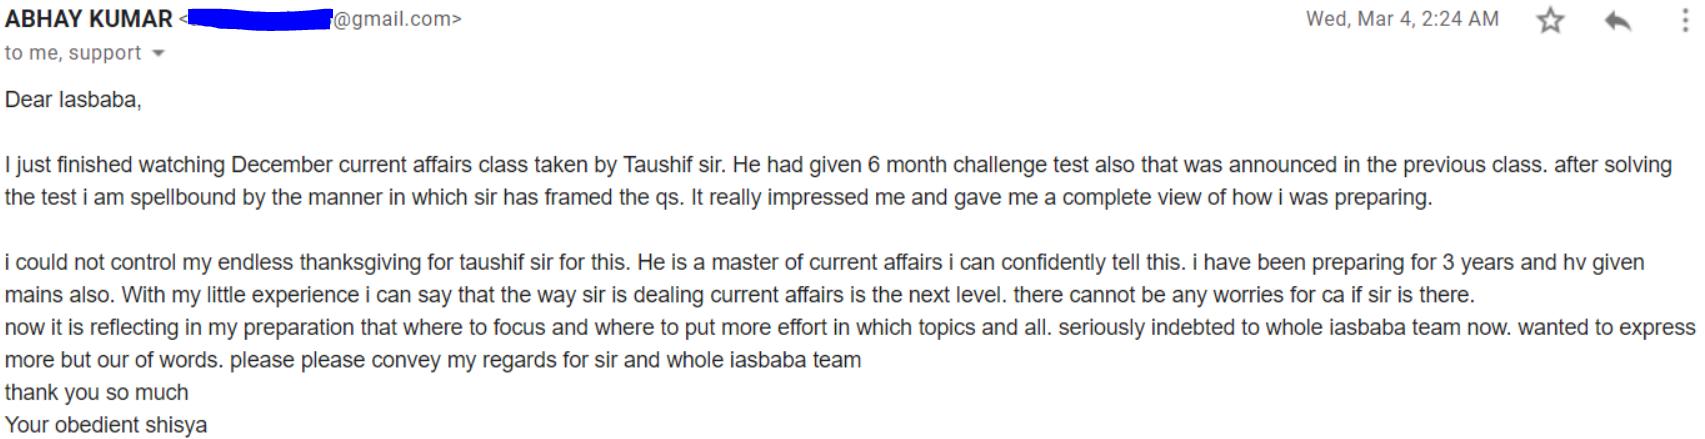 Abhay Kumar PEP Testimonial